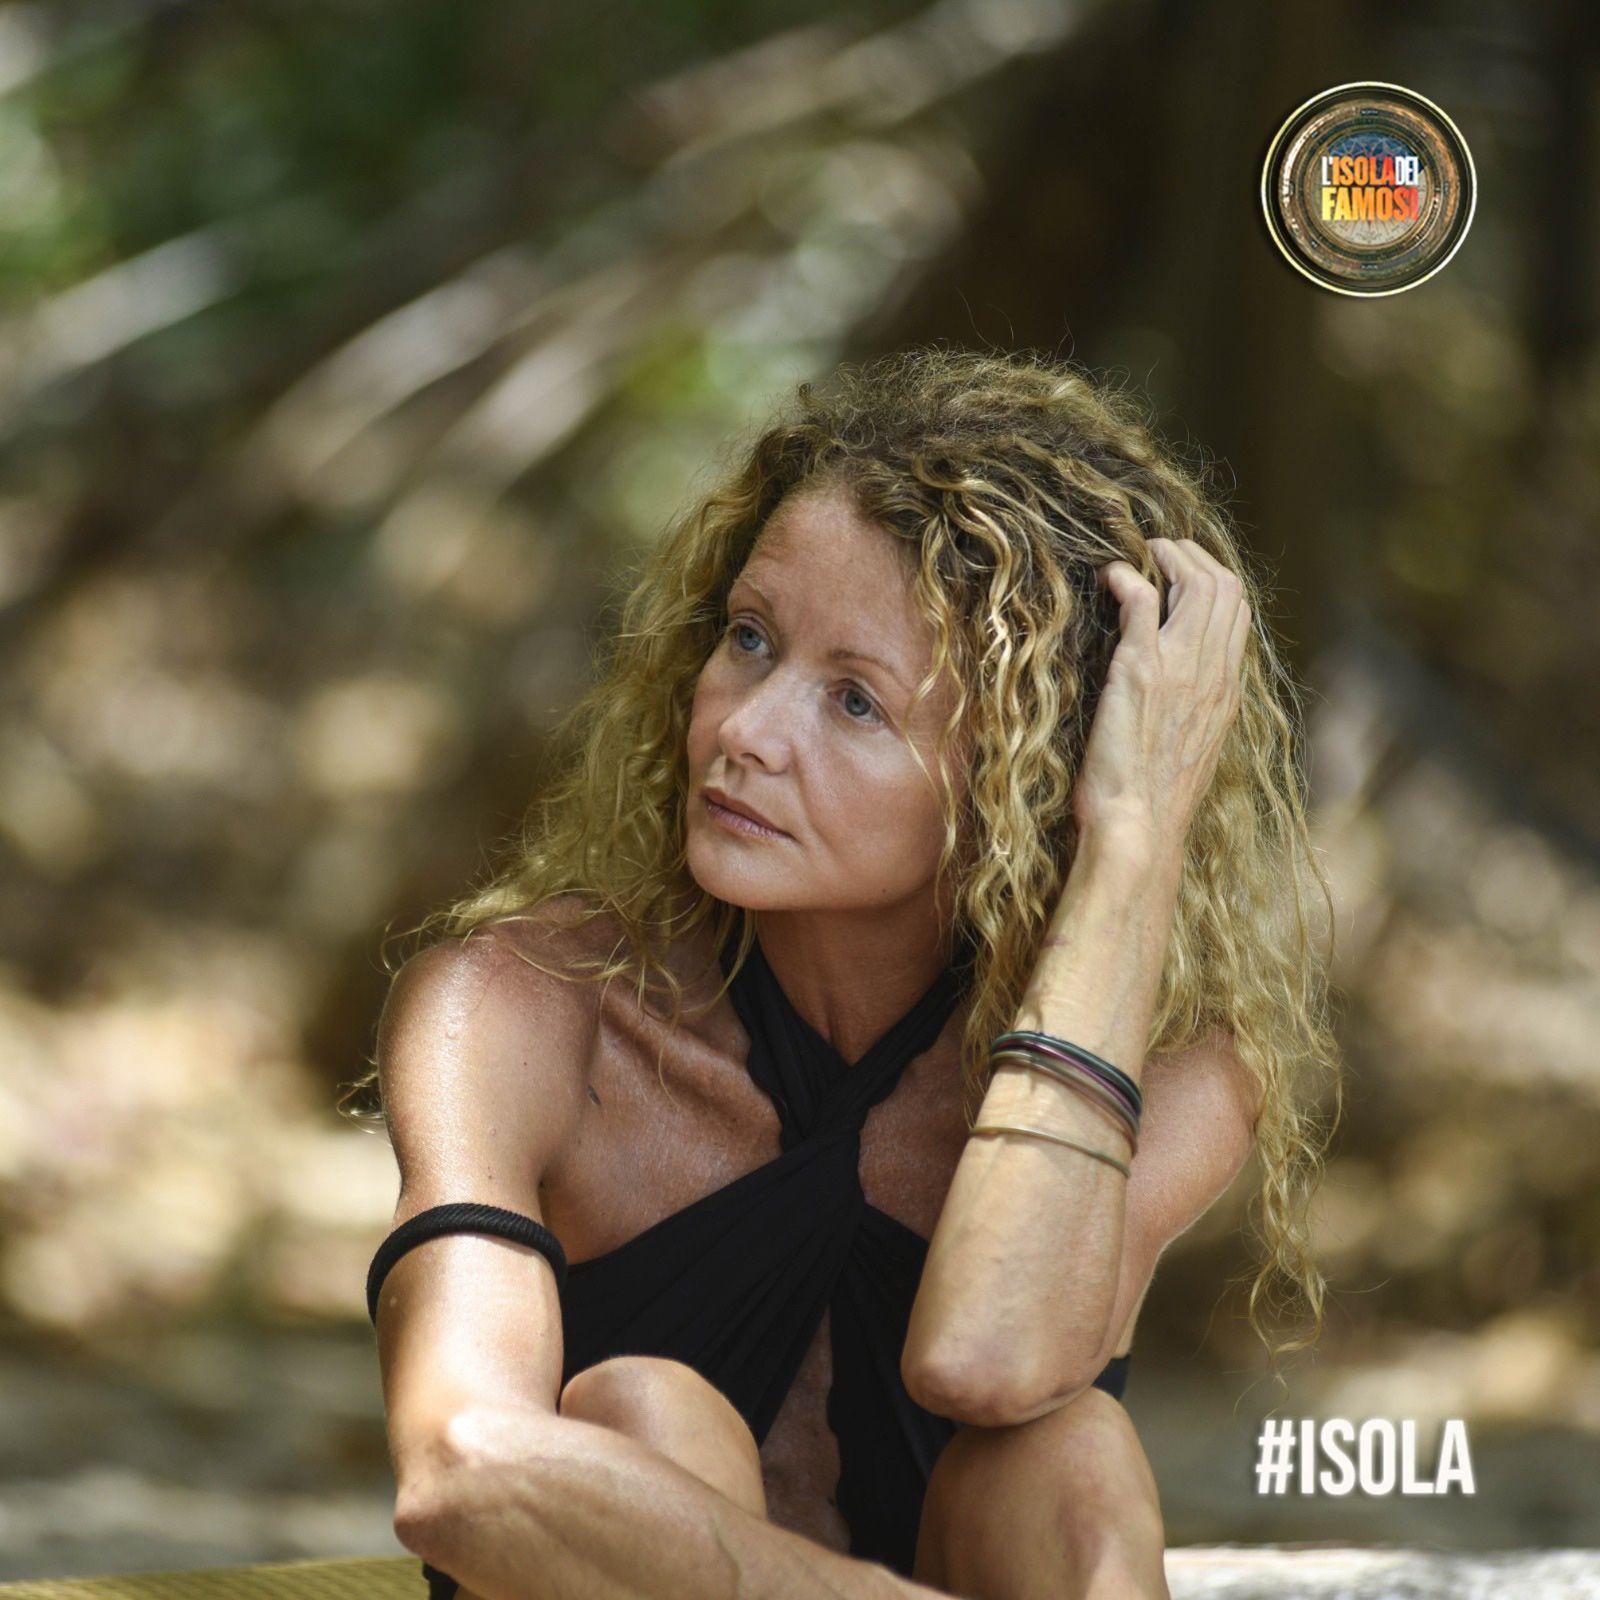 Angela Melillo saluta L'Isola dei Famosi col sorriso